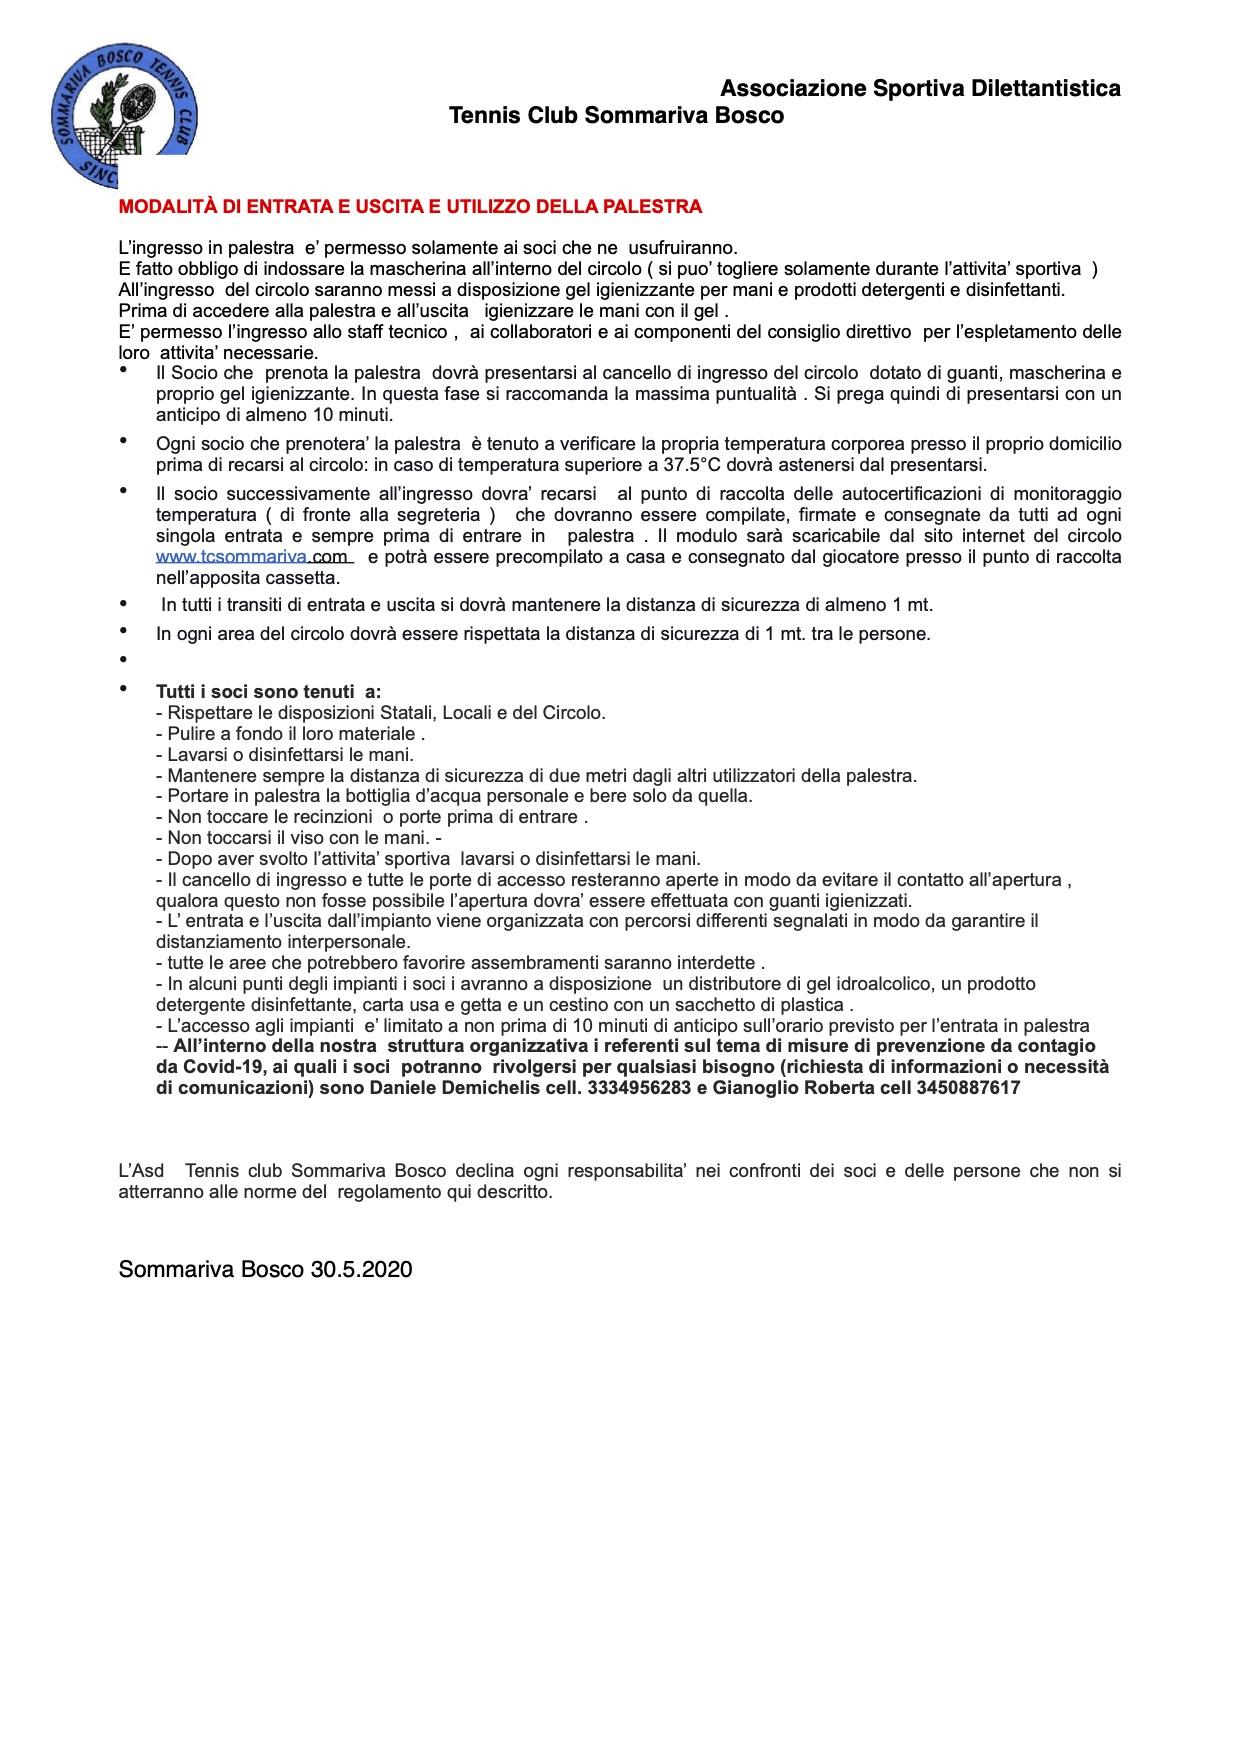 regolamento-palestra-tc-sommariva-bosco-2